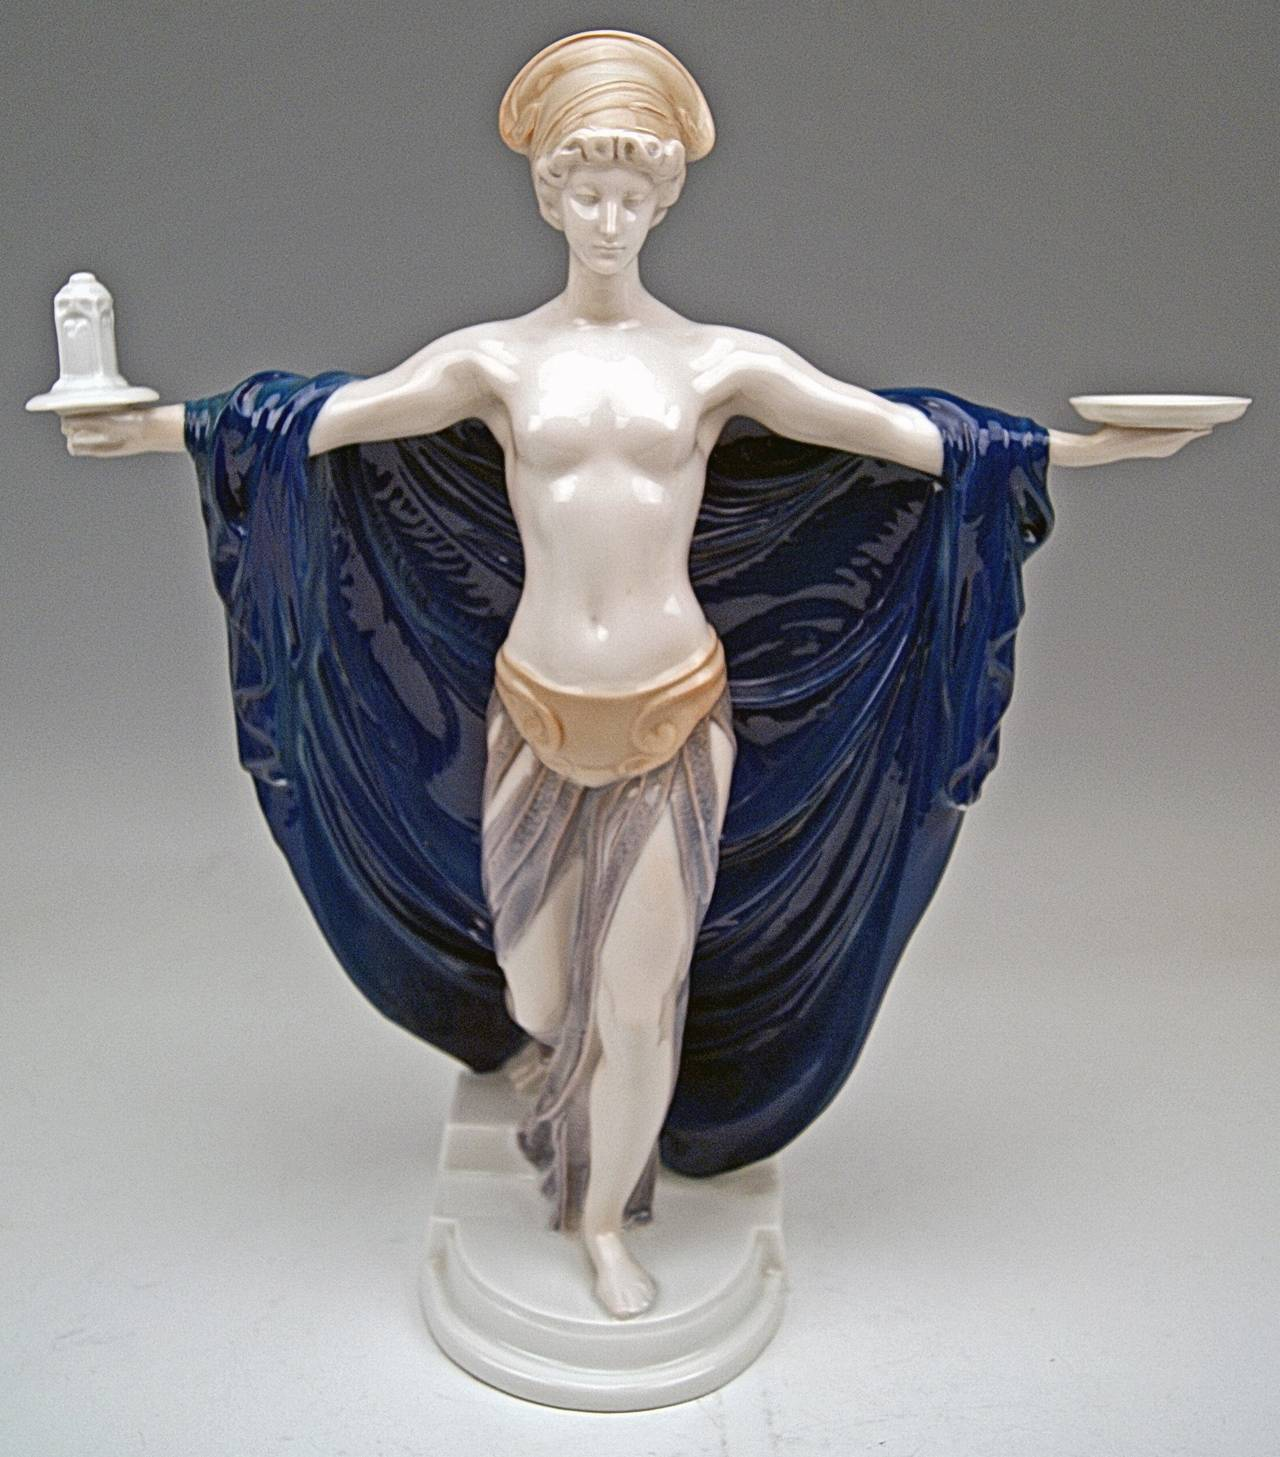 Rosenthal Germany Rare Figurine Temple Dedication by F. Liebermann, circa 1914 6